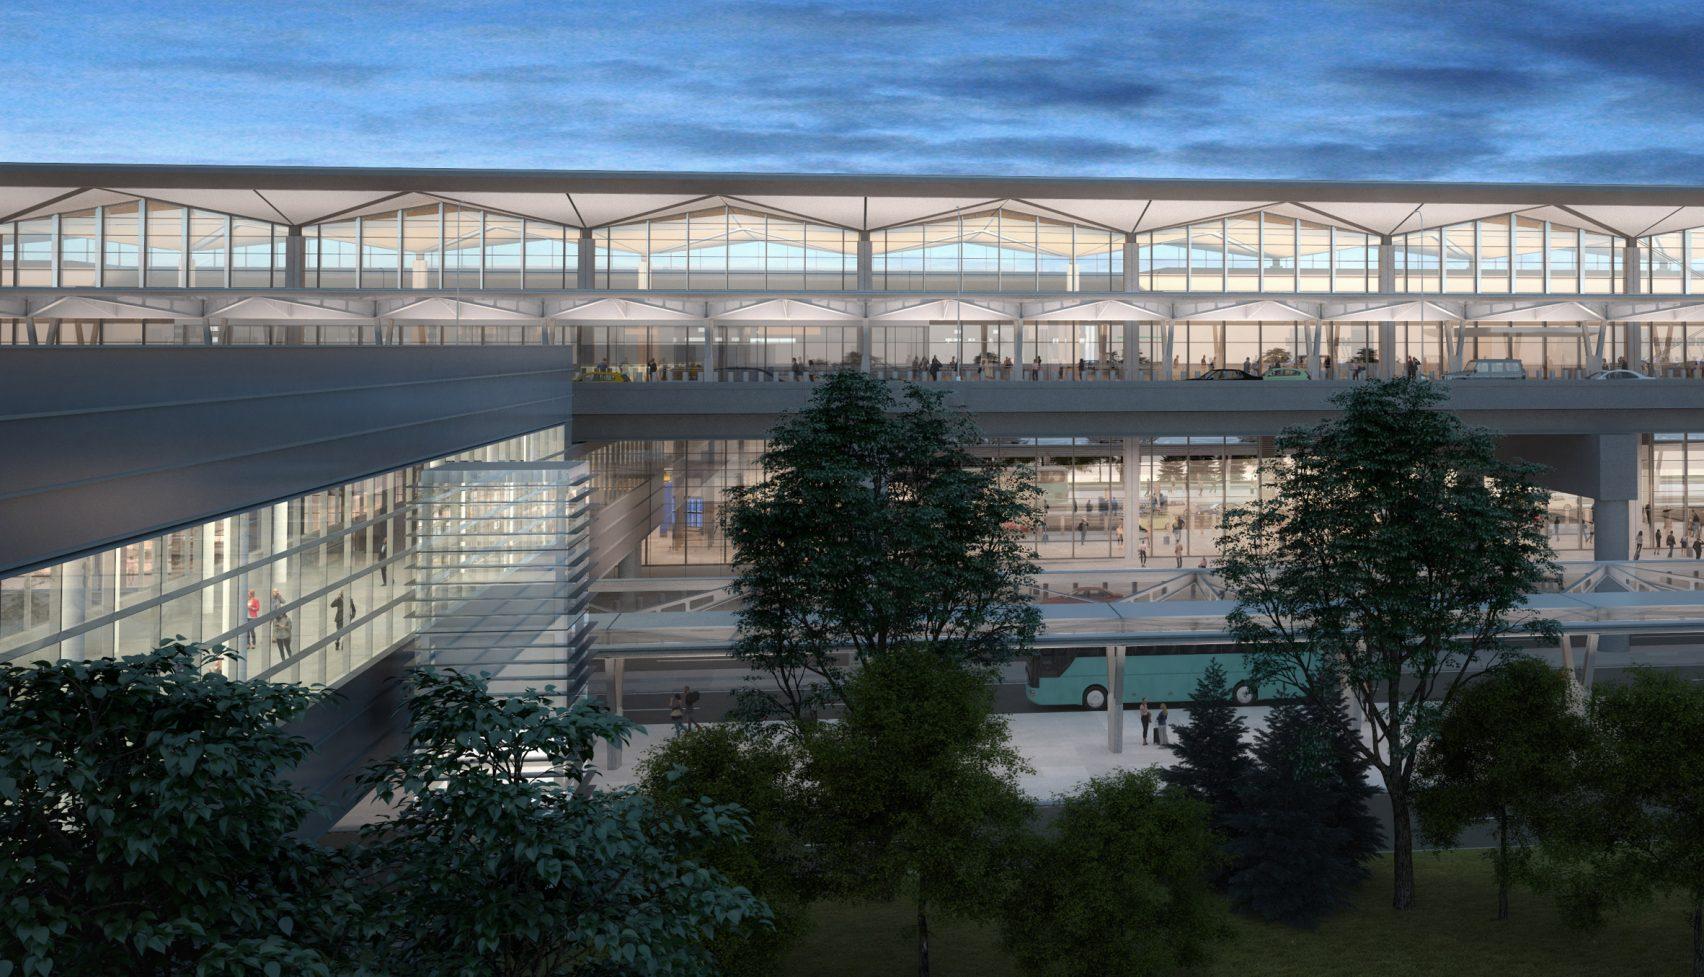 newark-liberty-terminal-one-grimshaw-architects-reno2.jpg